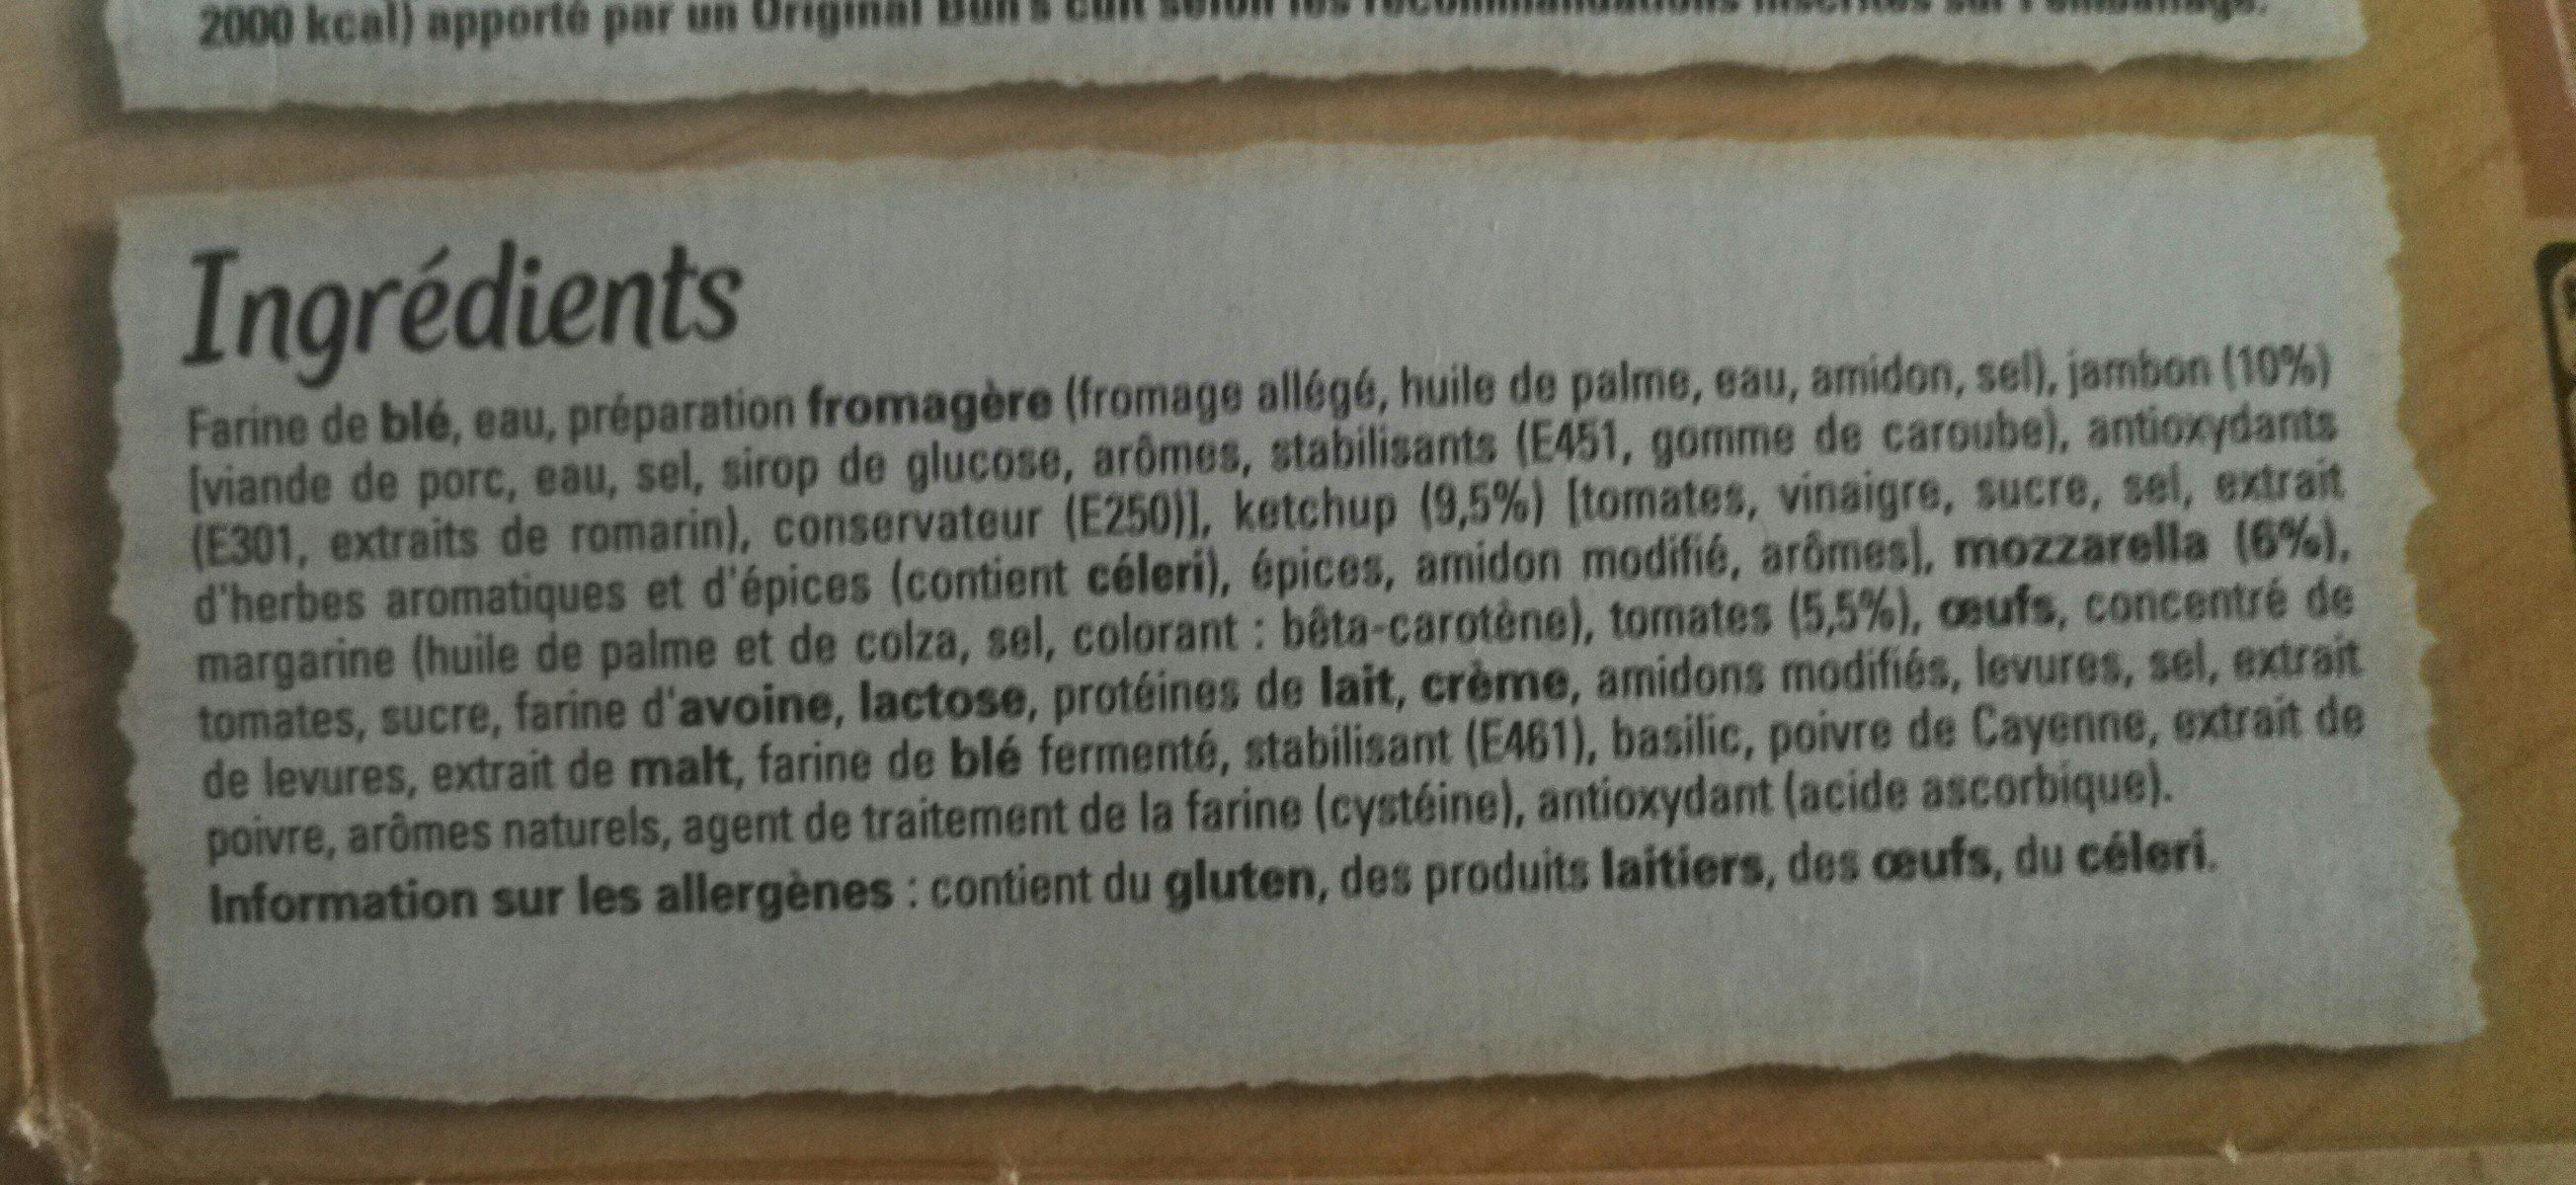 Bun's - Ingrédients - fr